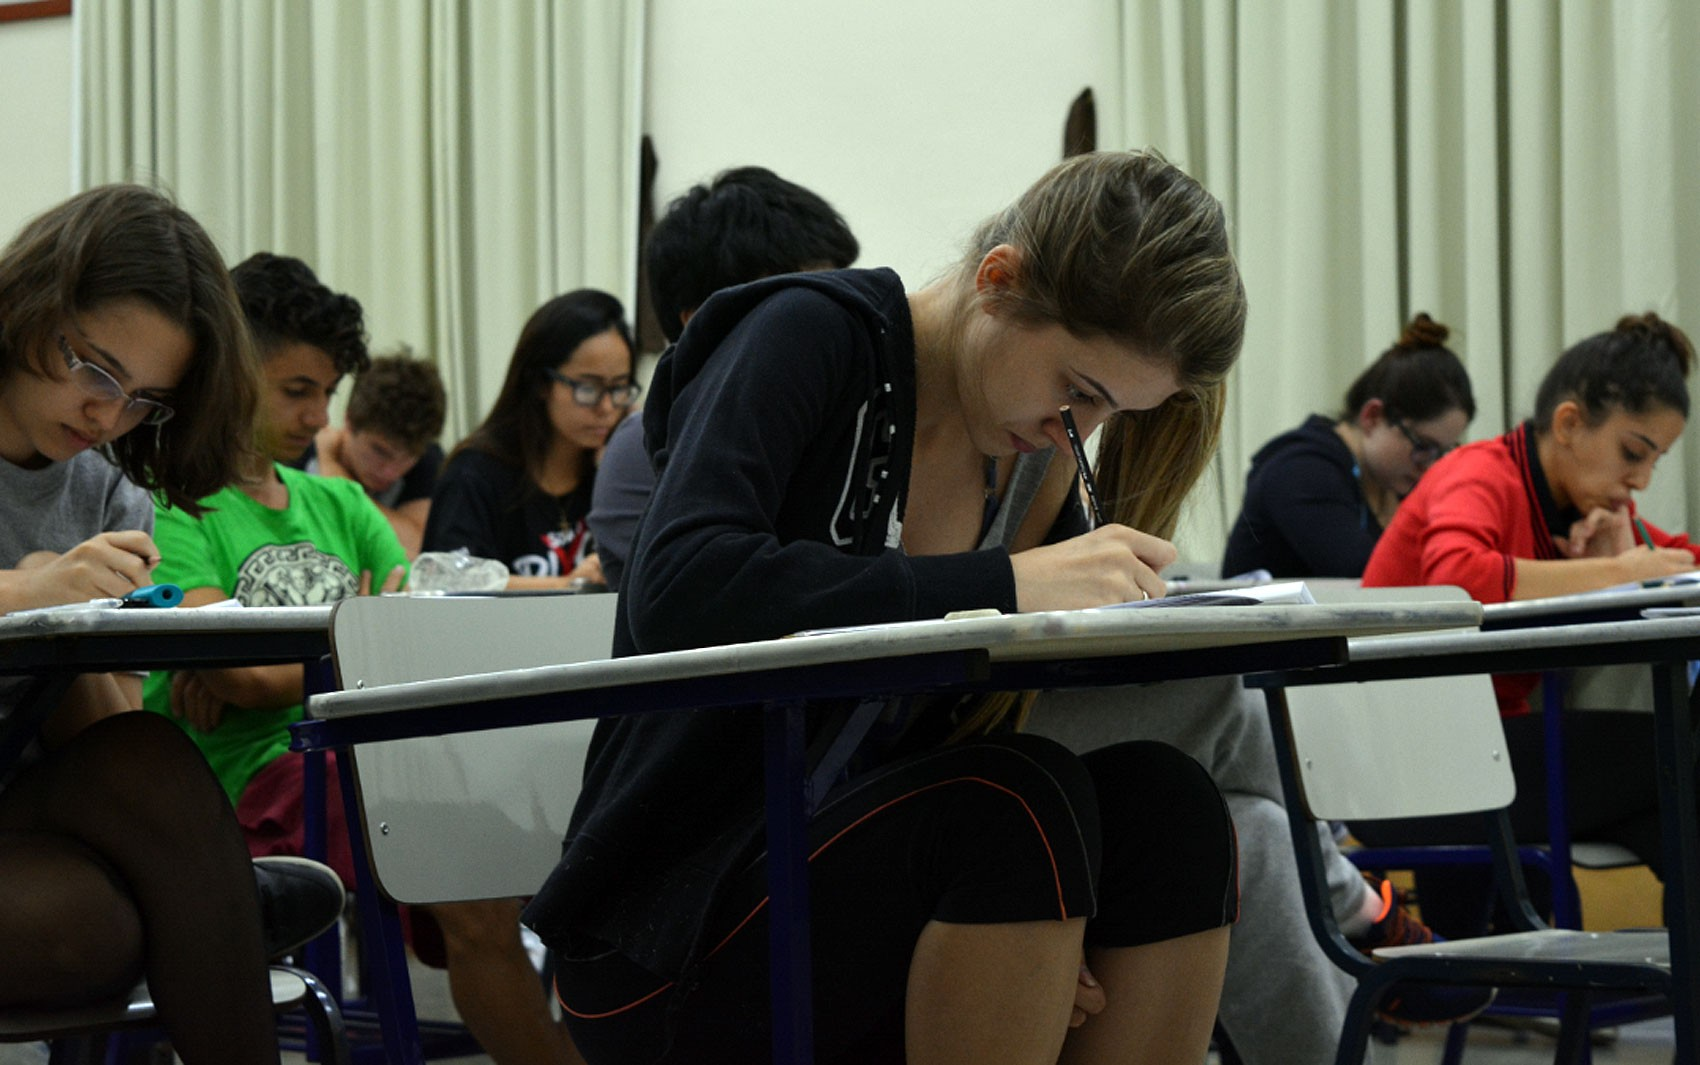 Unicamp promove tira-dúvidas em tempo real na internet para 1ª fase do vestibular 2018